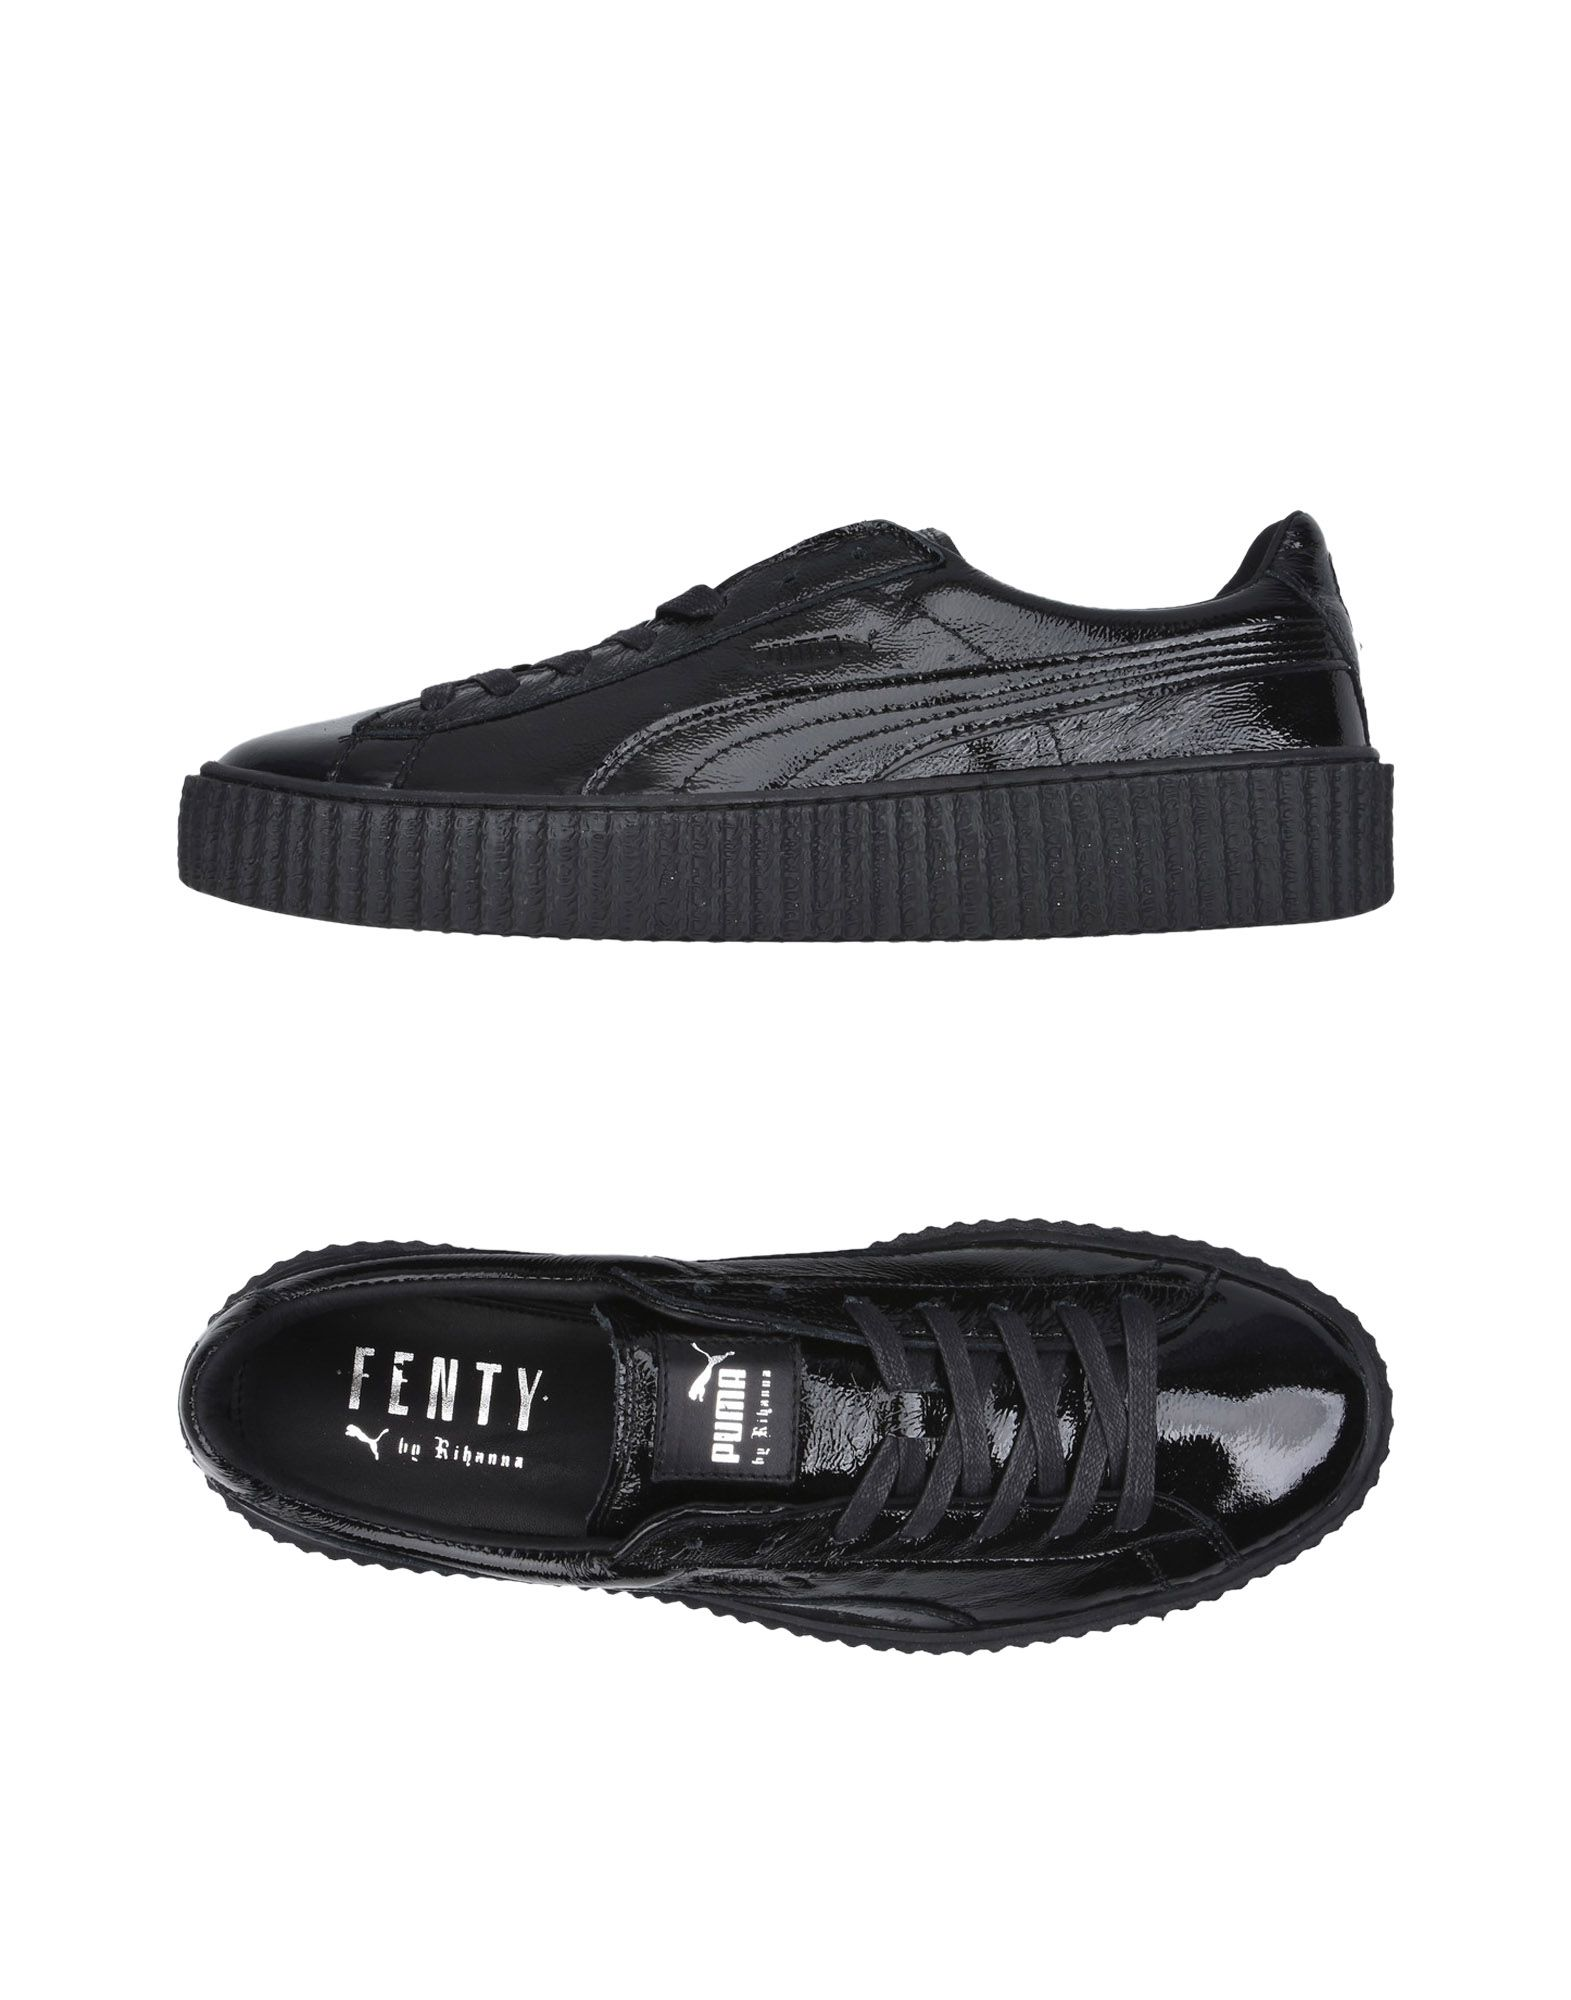 Fenty Puma Leather By Rihanna Creeper Cracked Leather Puma Men  11250500SS Gute Qualität beliebte Schuhe 3d49fa